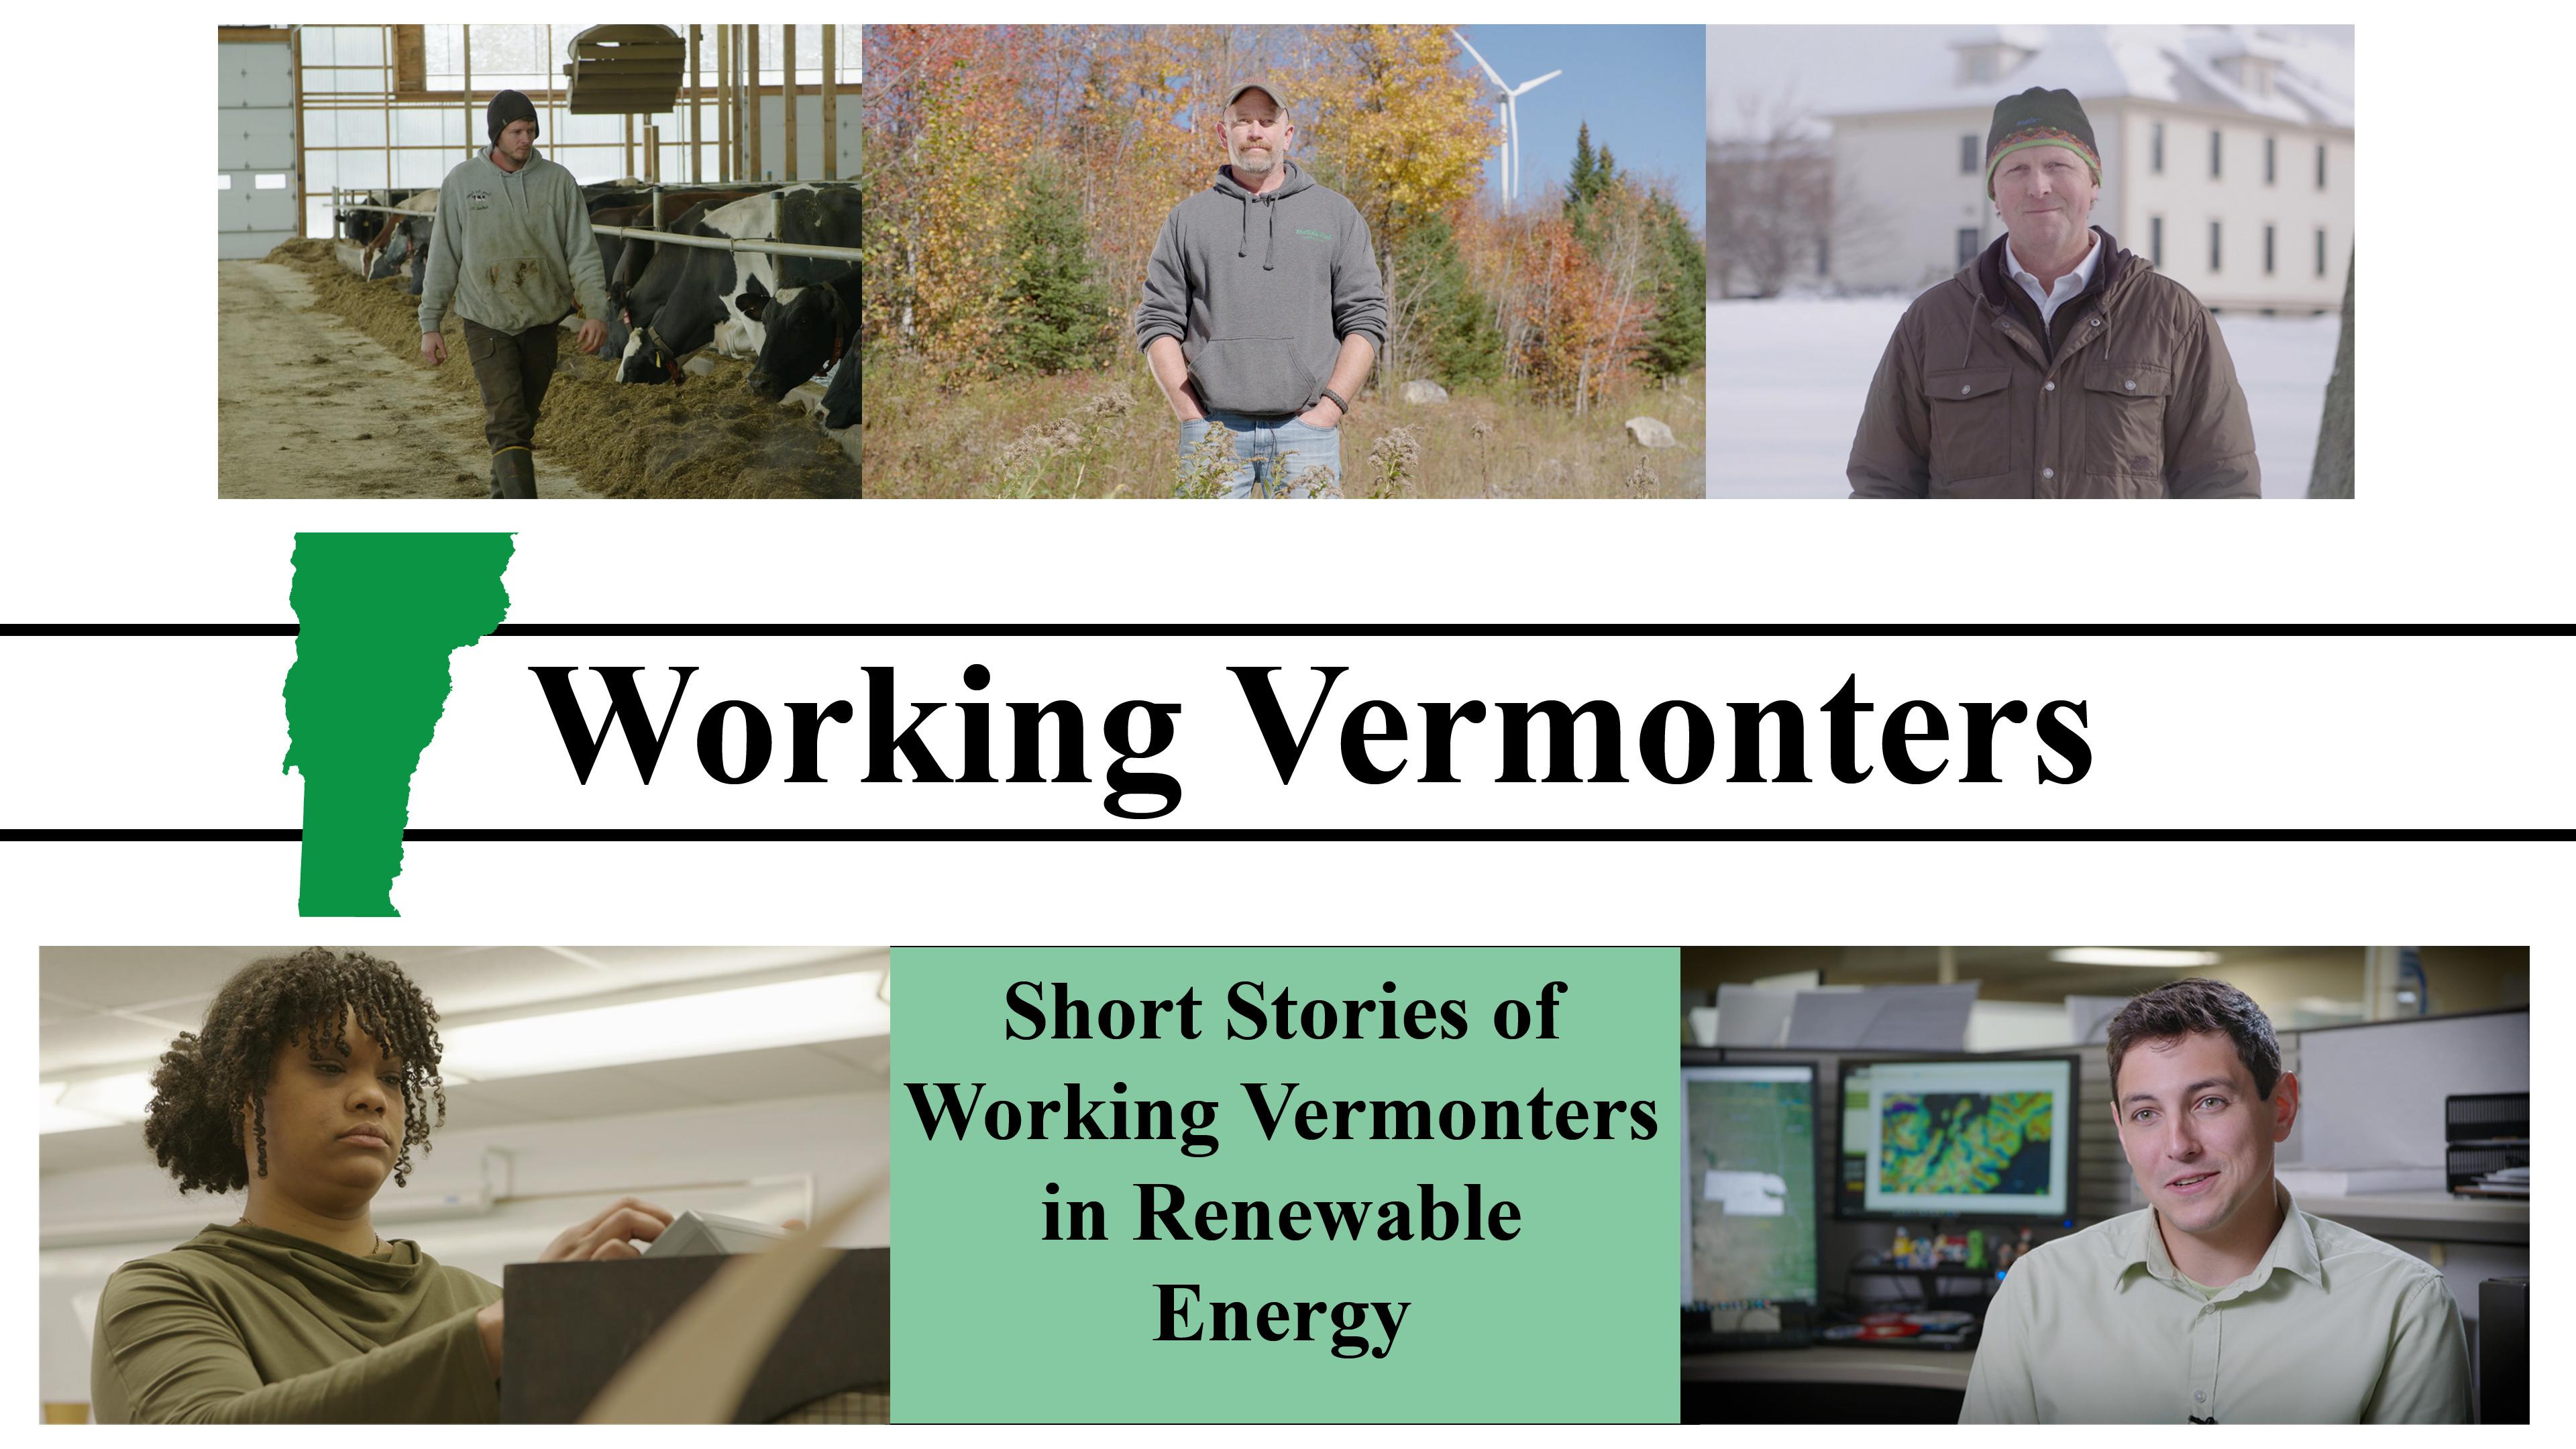 5 Working Vermonters